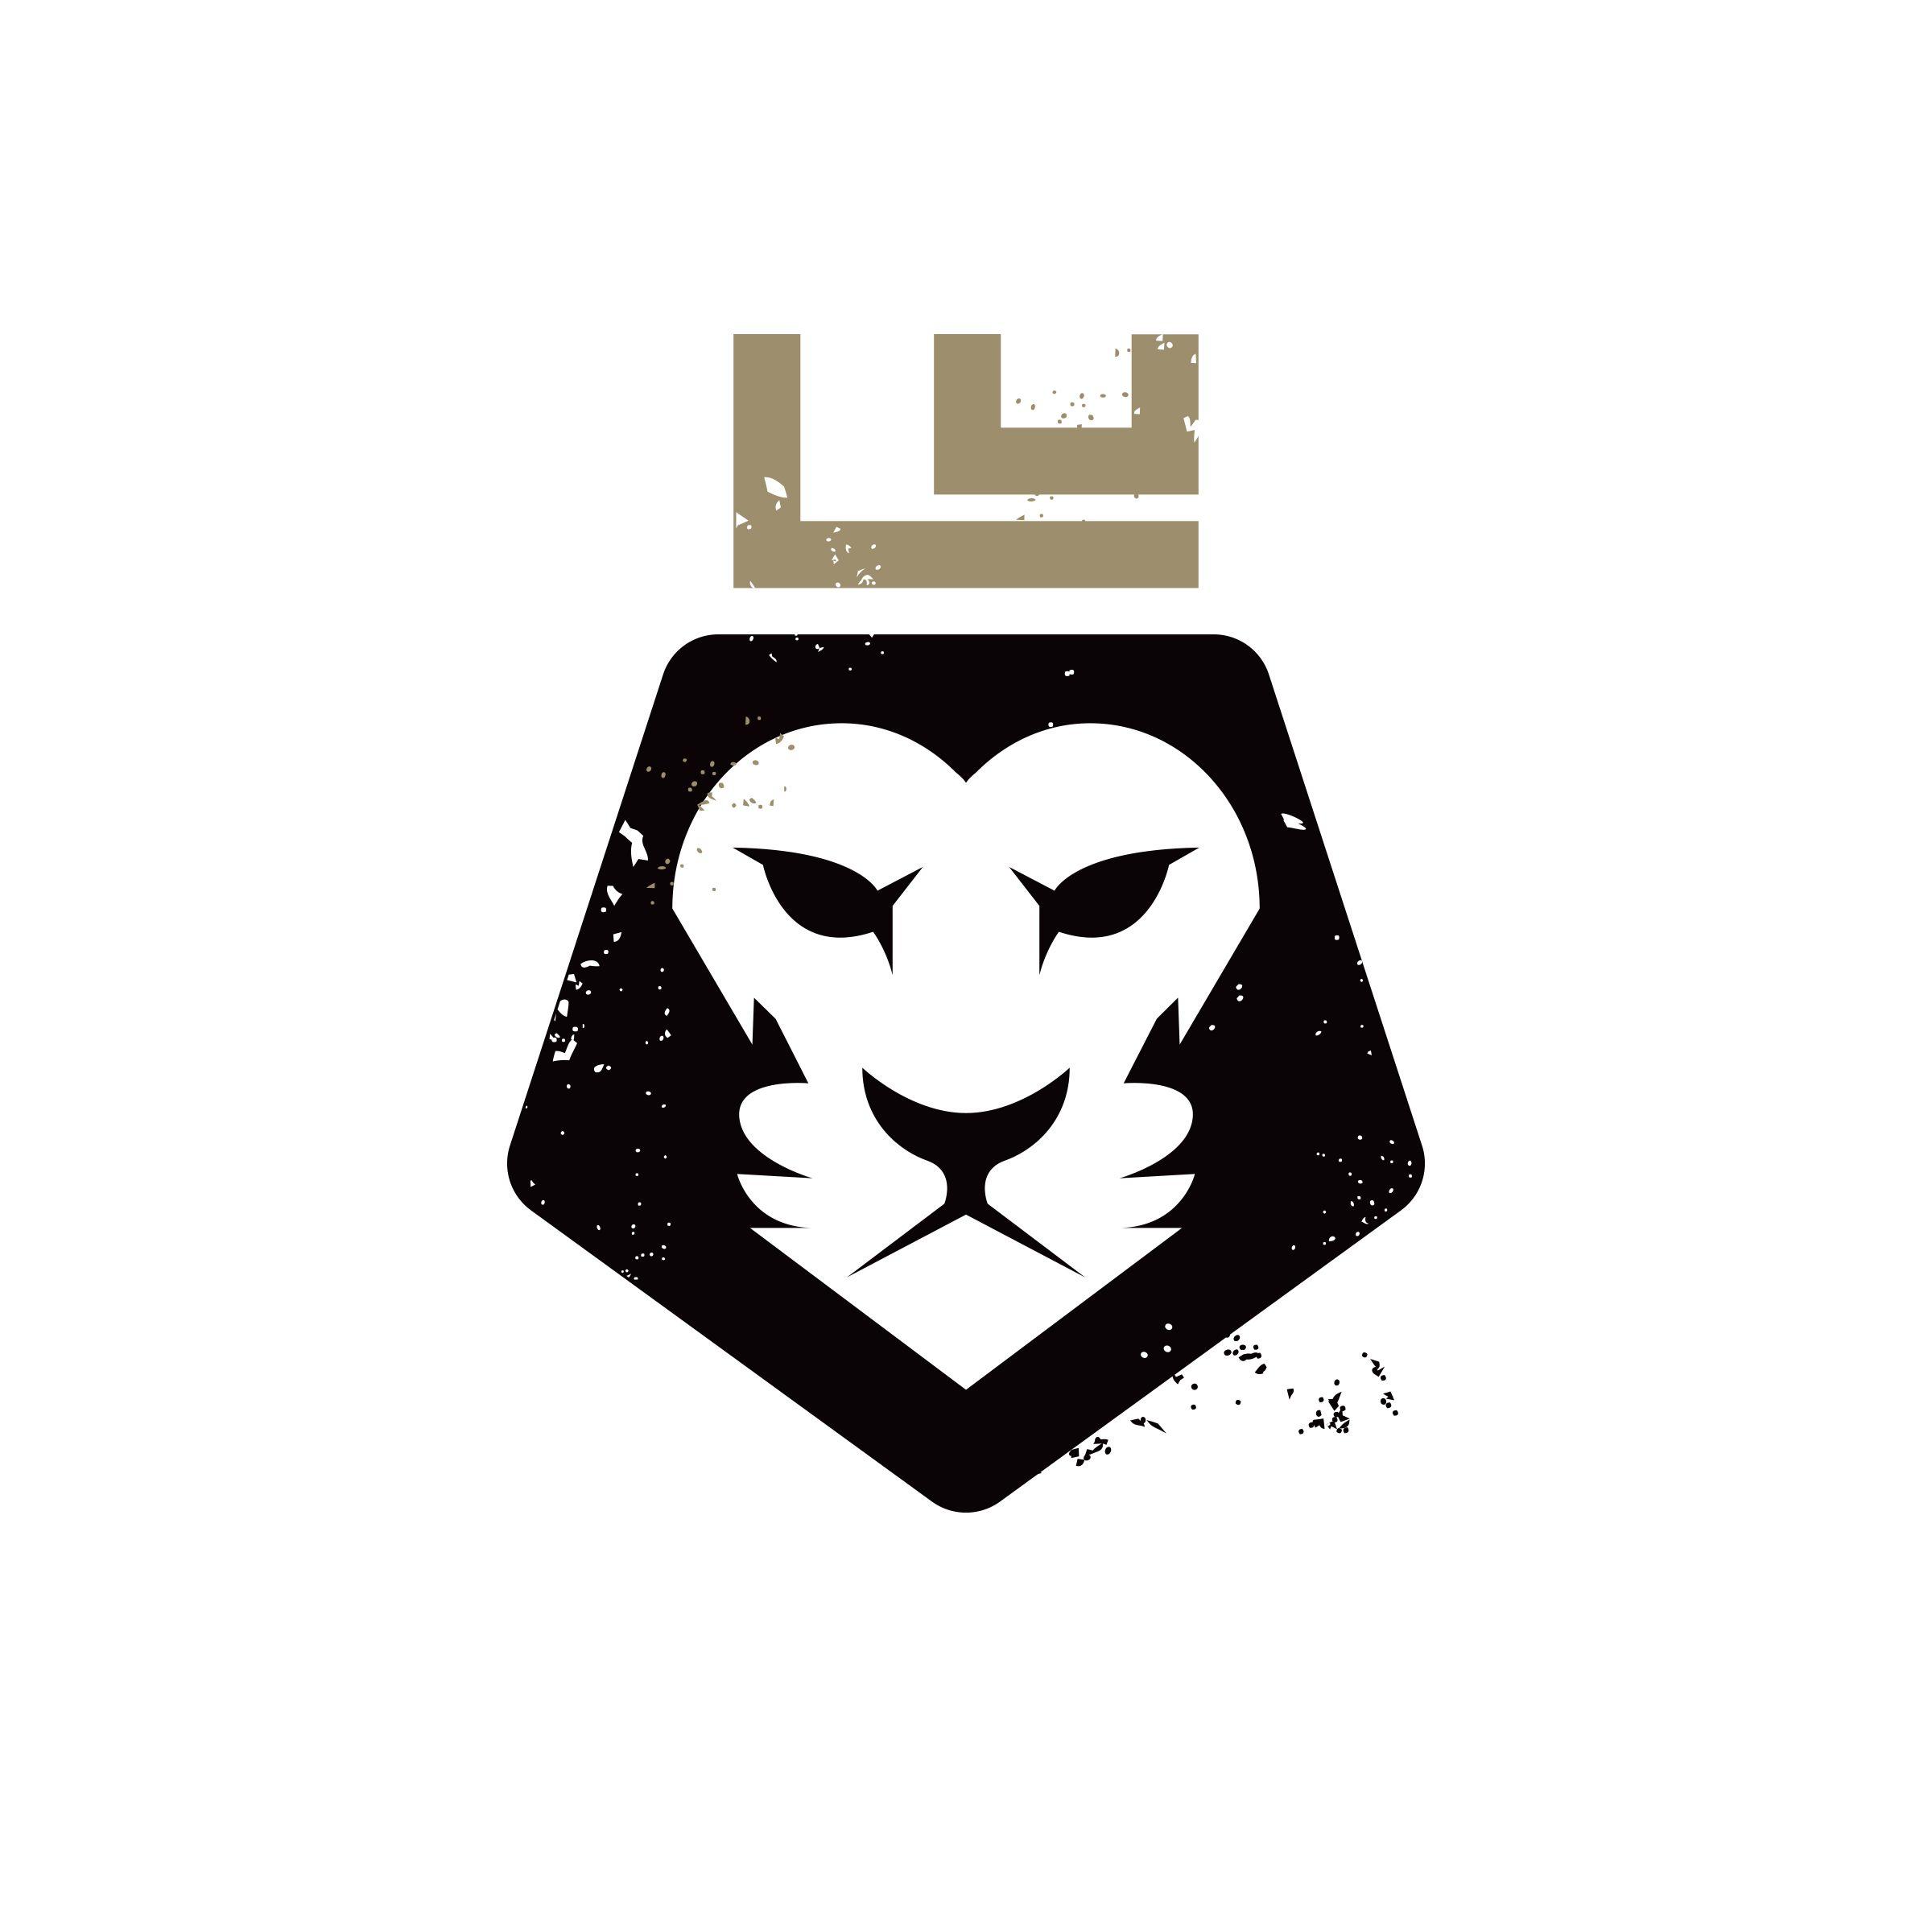 Level up Soccer training logo design - - - - #lionlogo ...